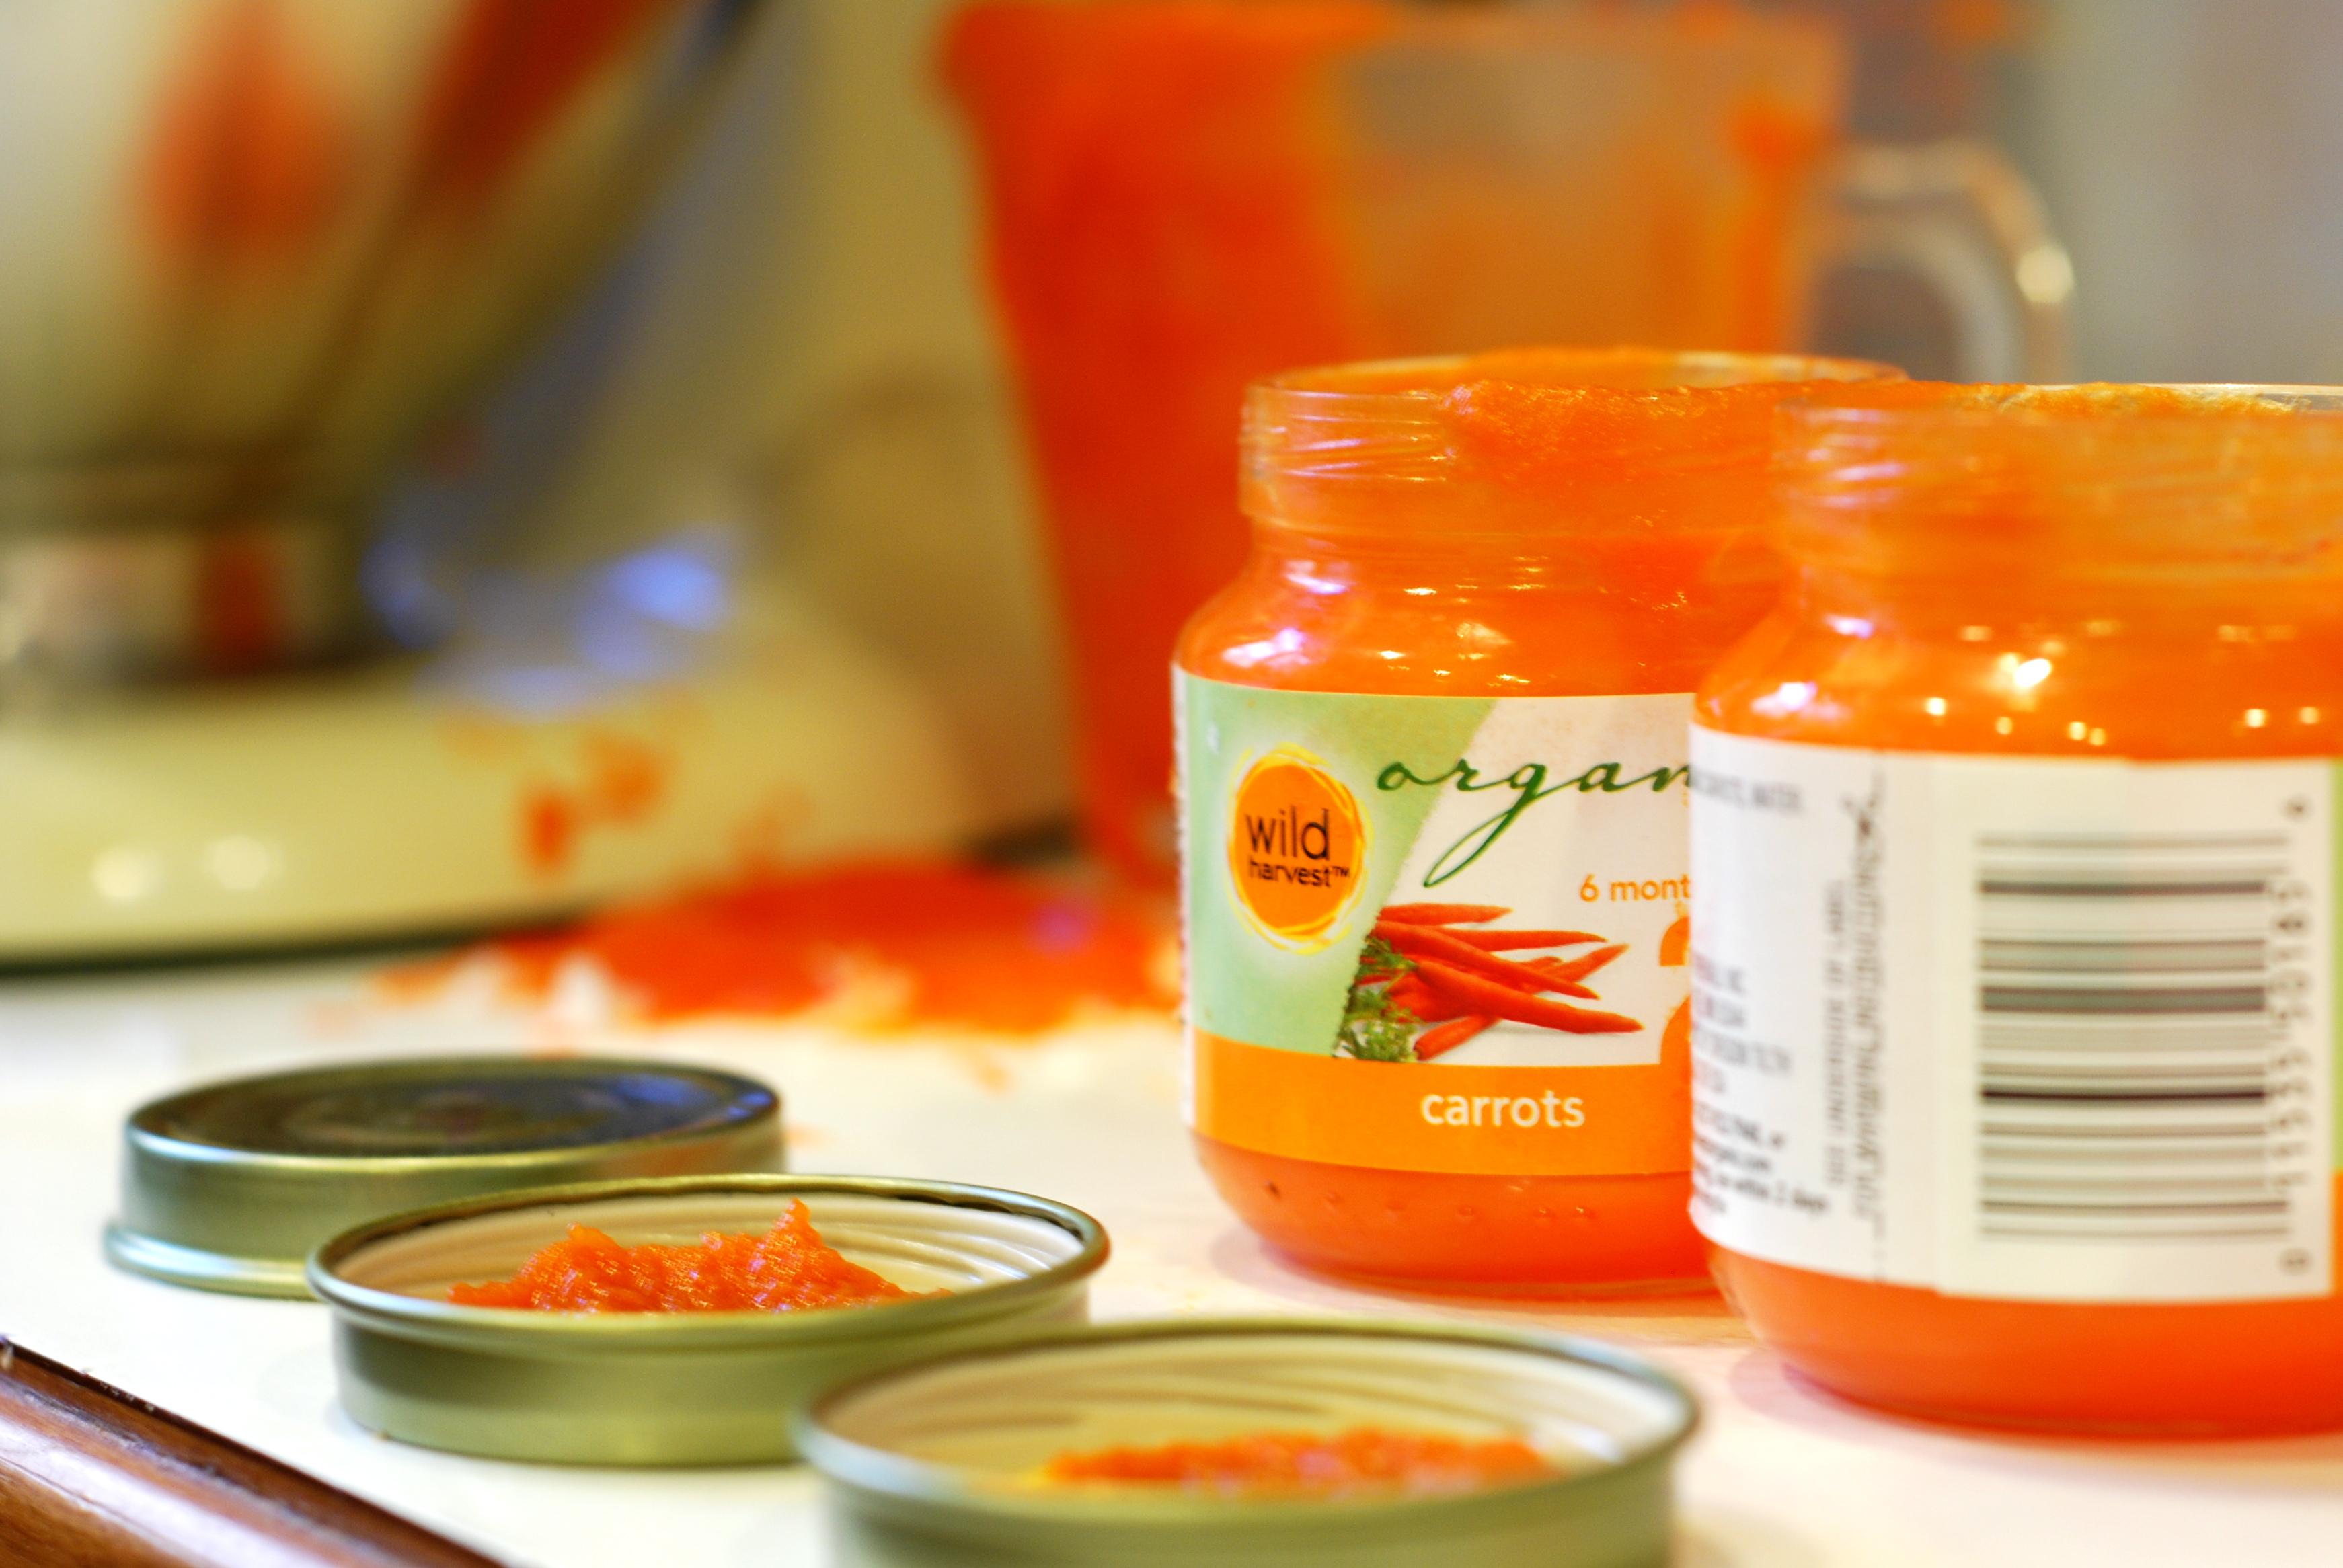 Cuisinart Carrot Cake Recipe